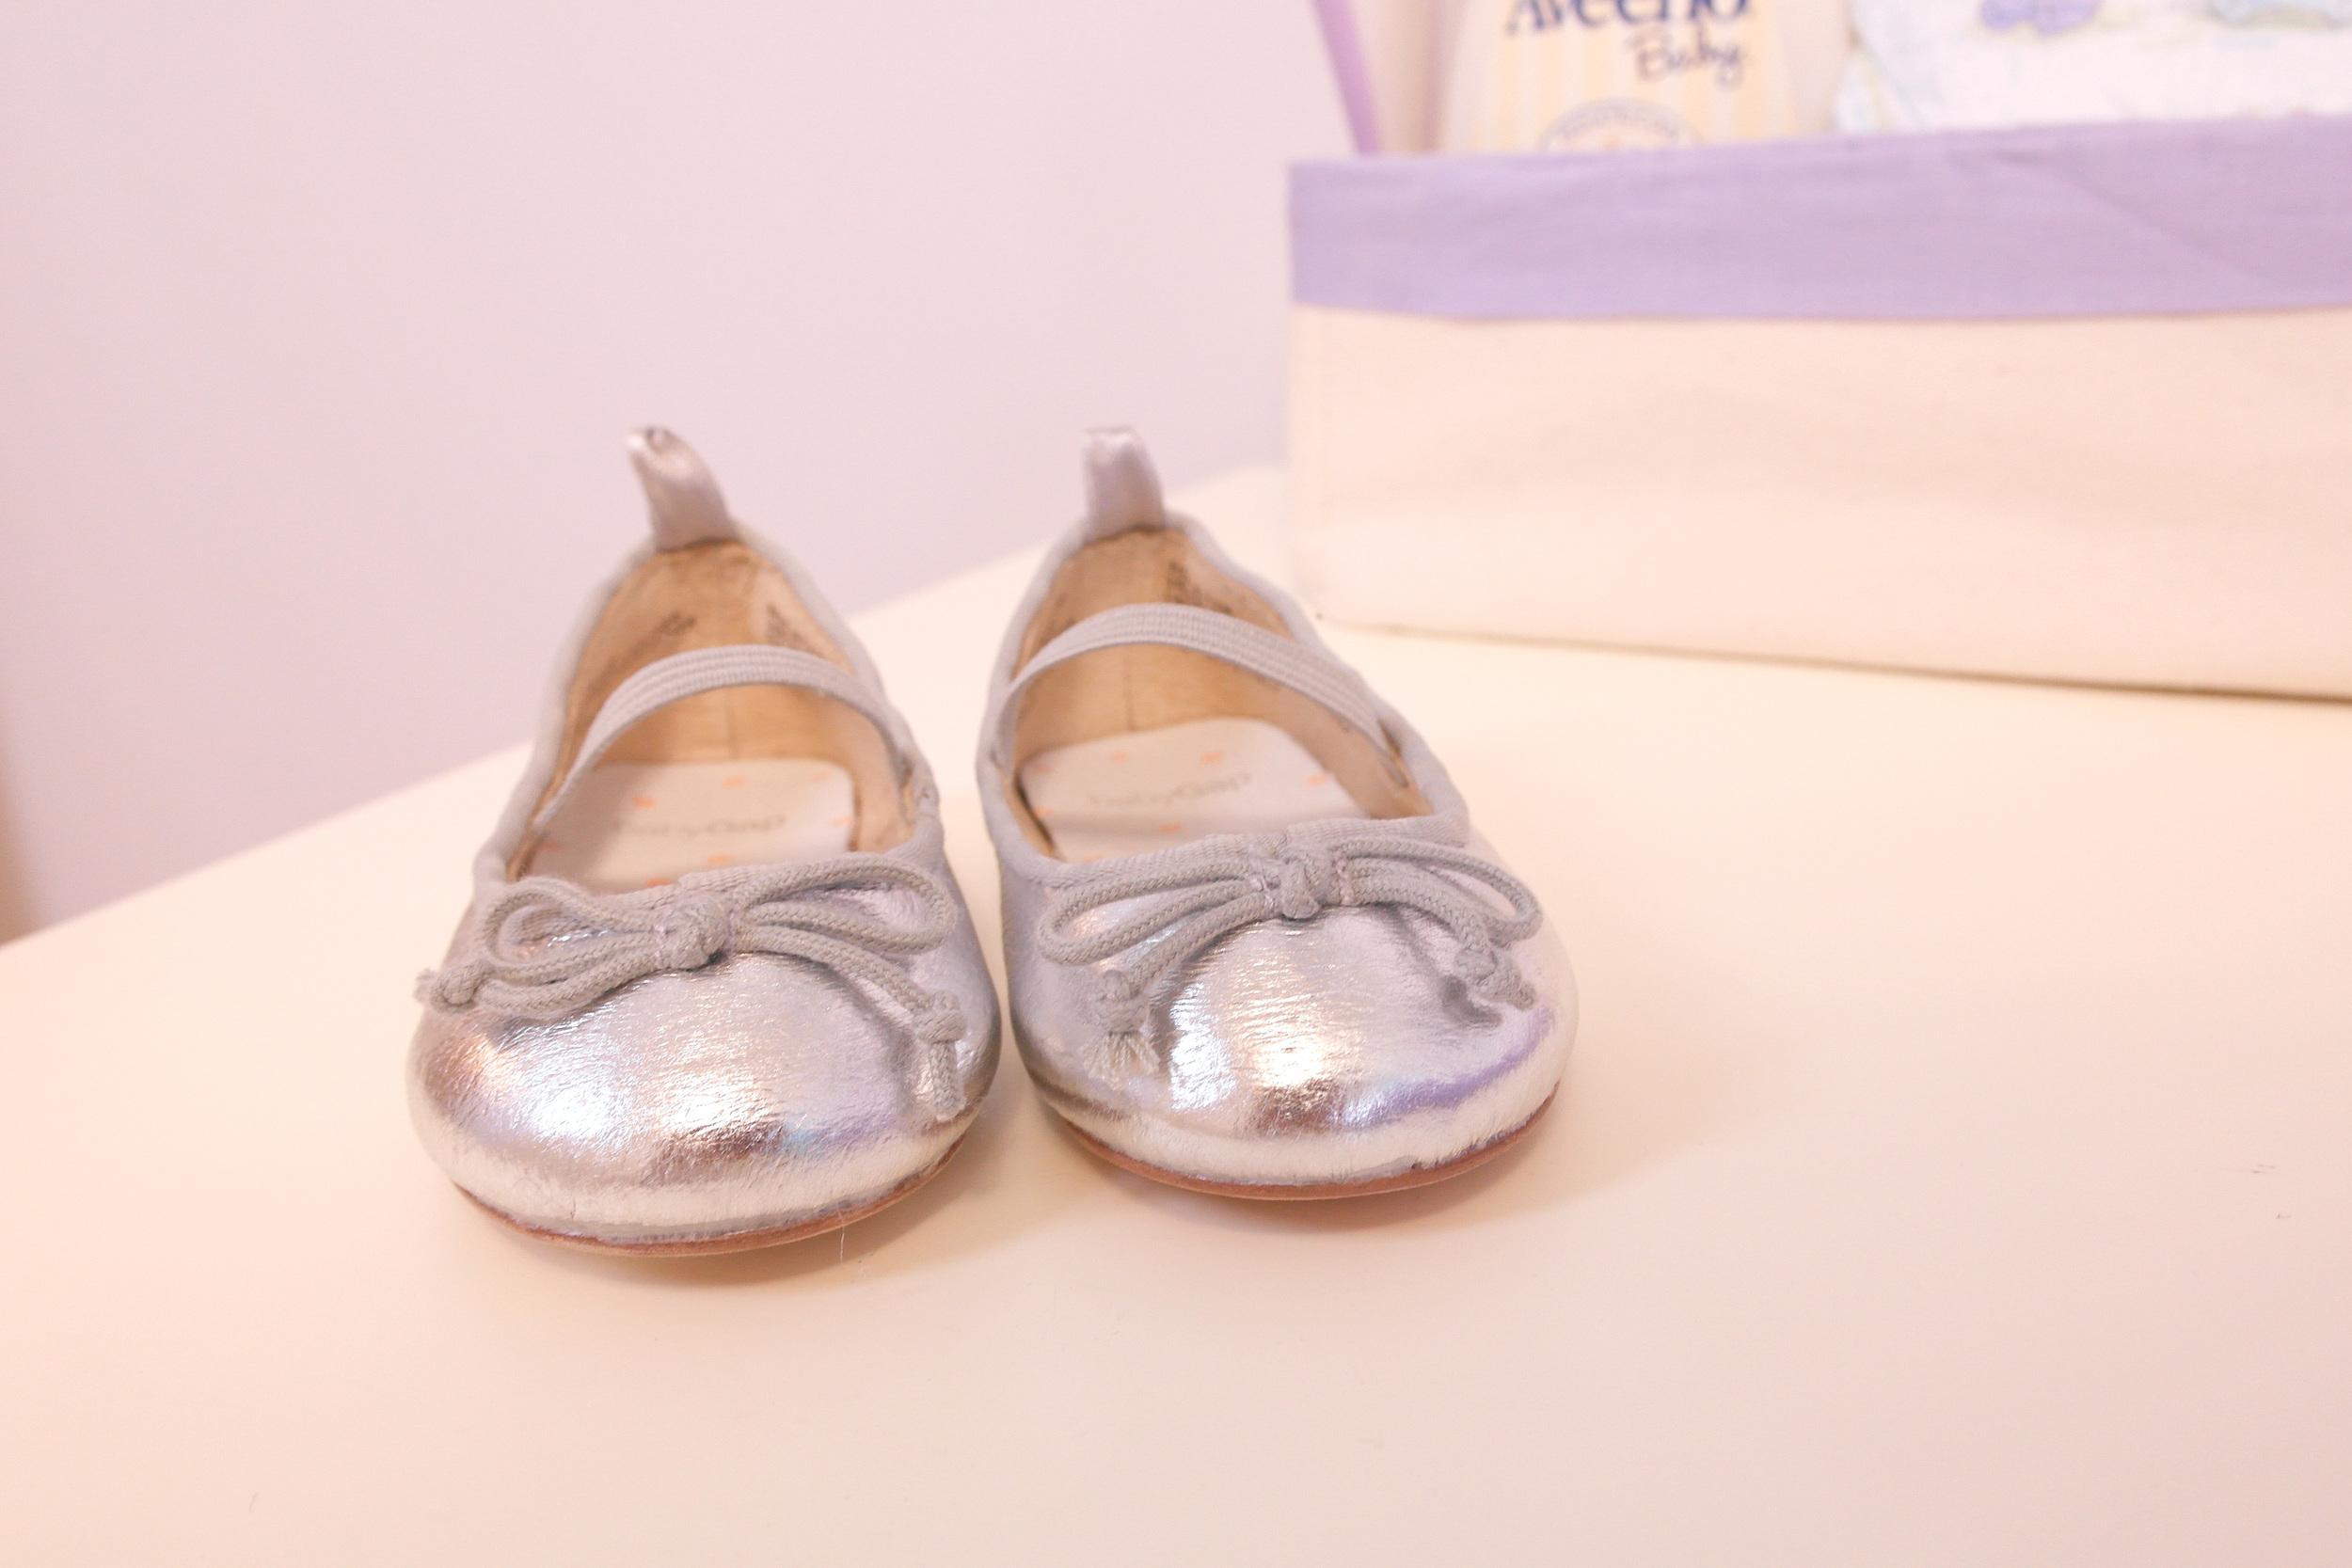 Amelias-Decorating-and-Design-New-Jersey-Interior-Design-Baby-Veroncia-Nursery-Design-silver-baby-shoes.jpg